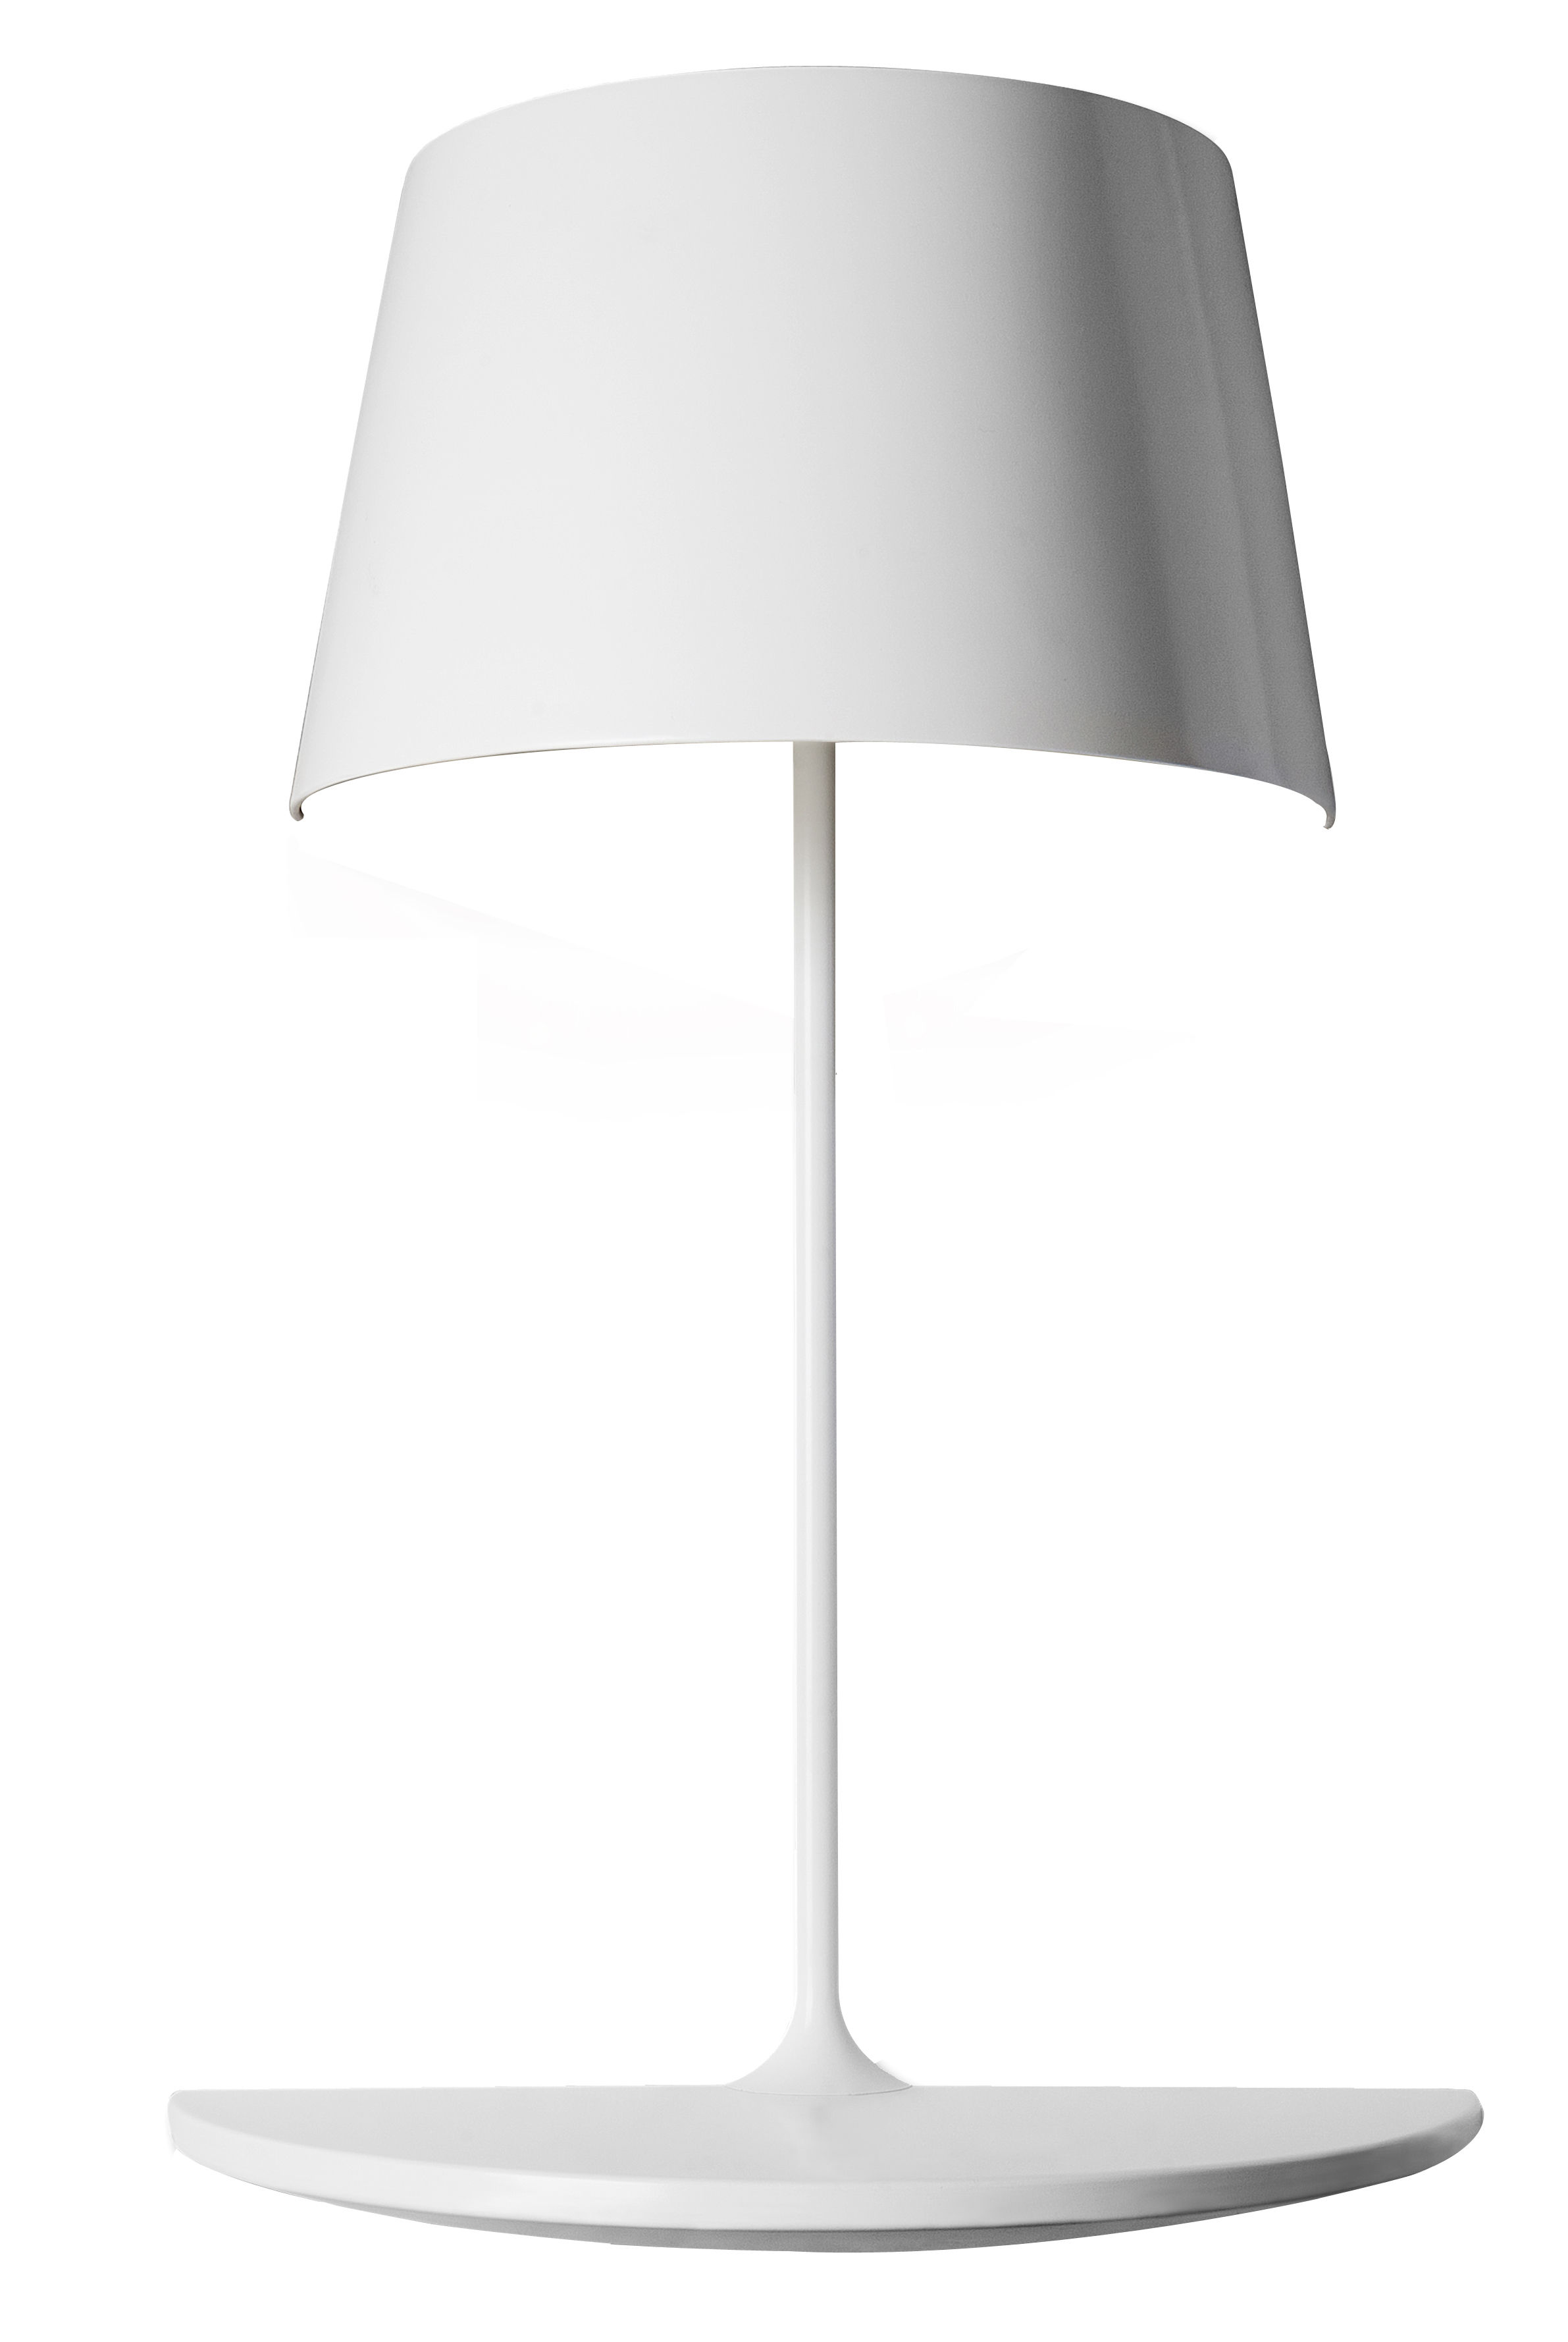 Furniture - Bookcases & Bookshelves - Ilusion Half Wall light - Shelf by Northern  - White - Aluminium, Steel